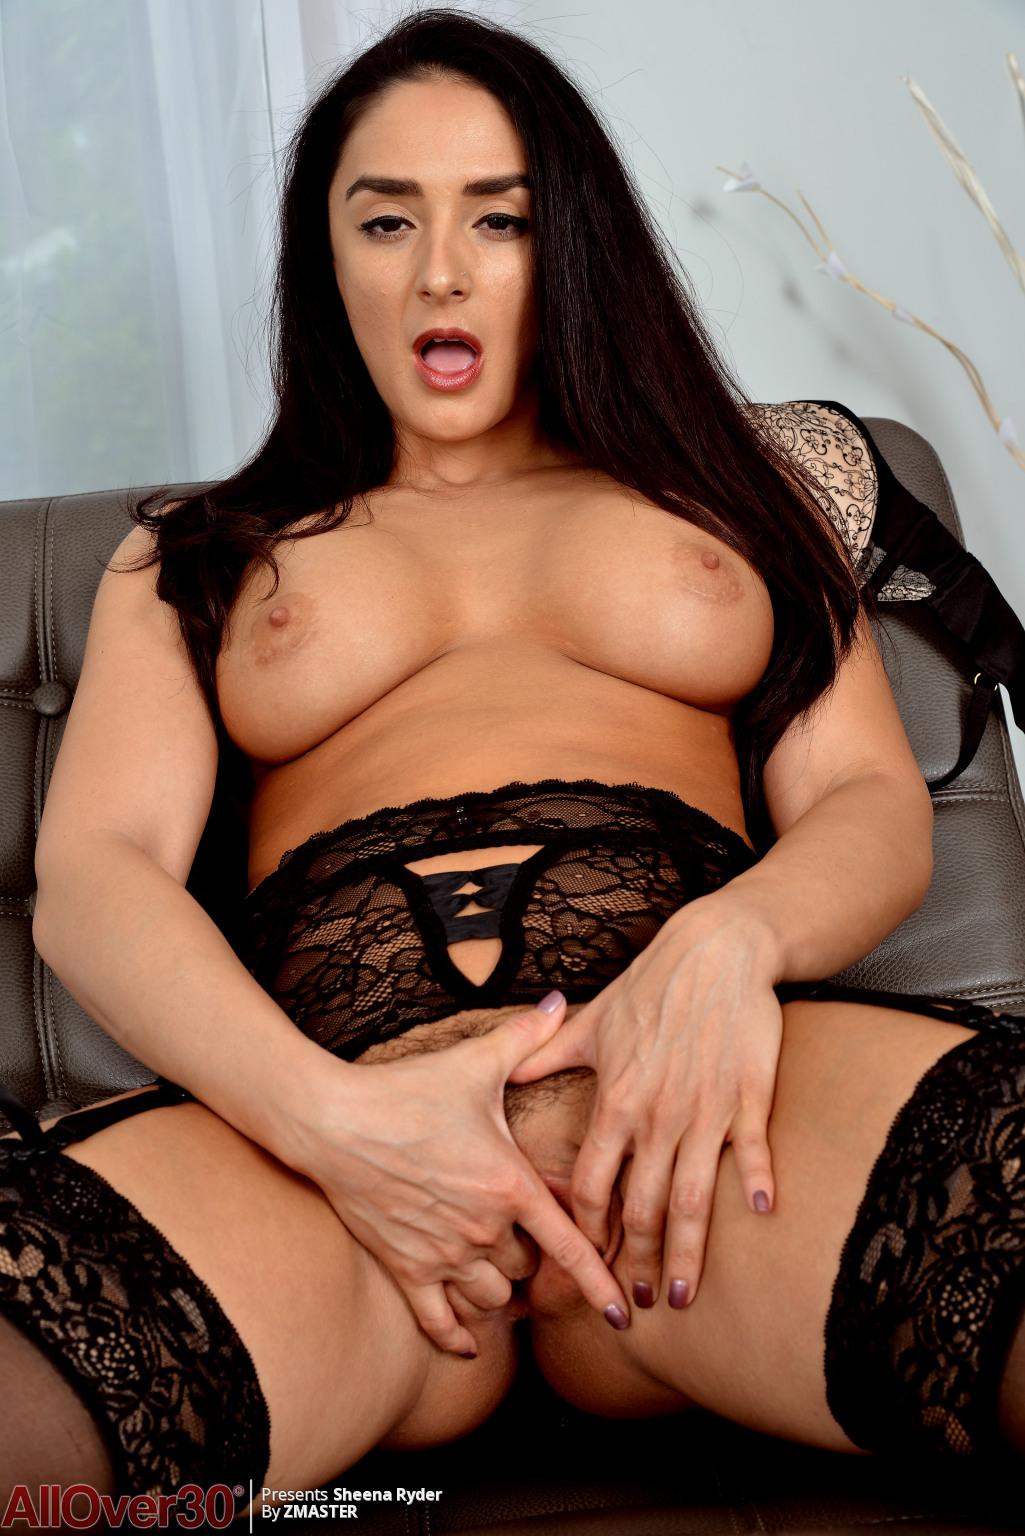 big-tits-beauty-sheena-ryder-14